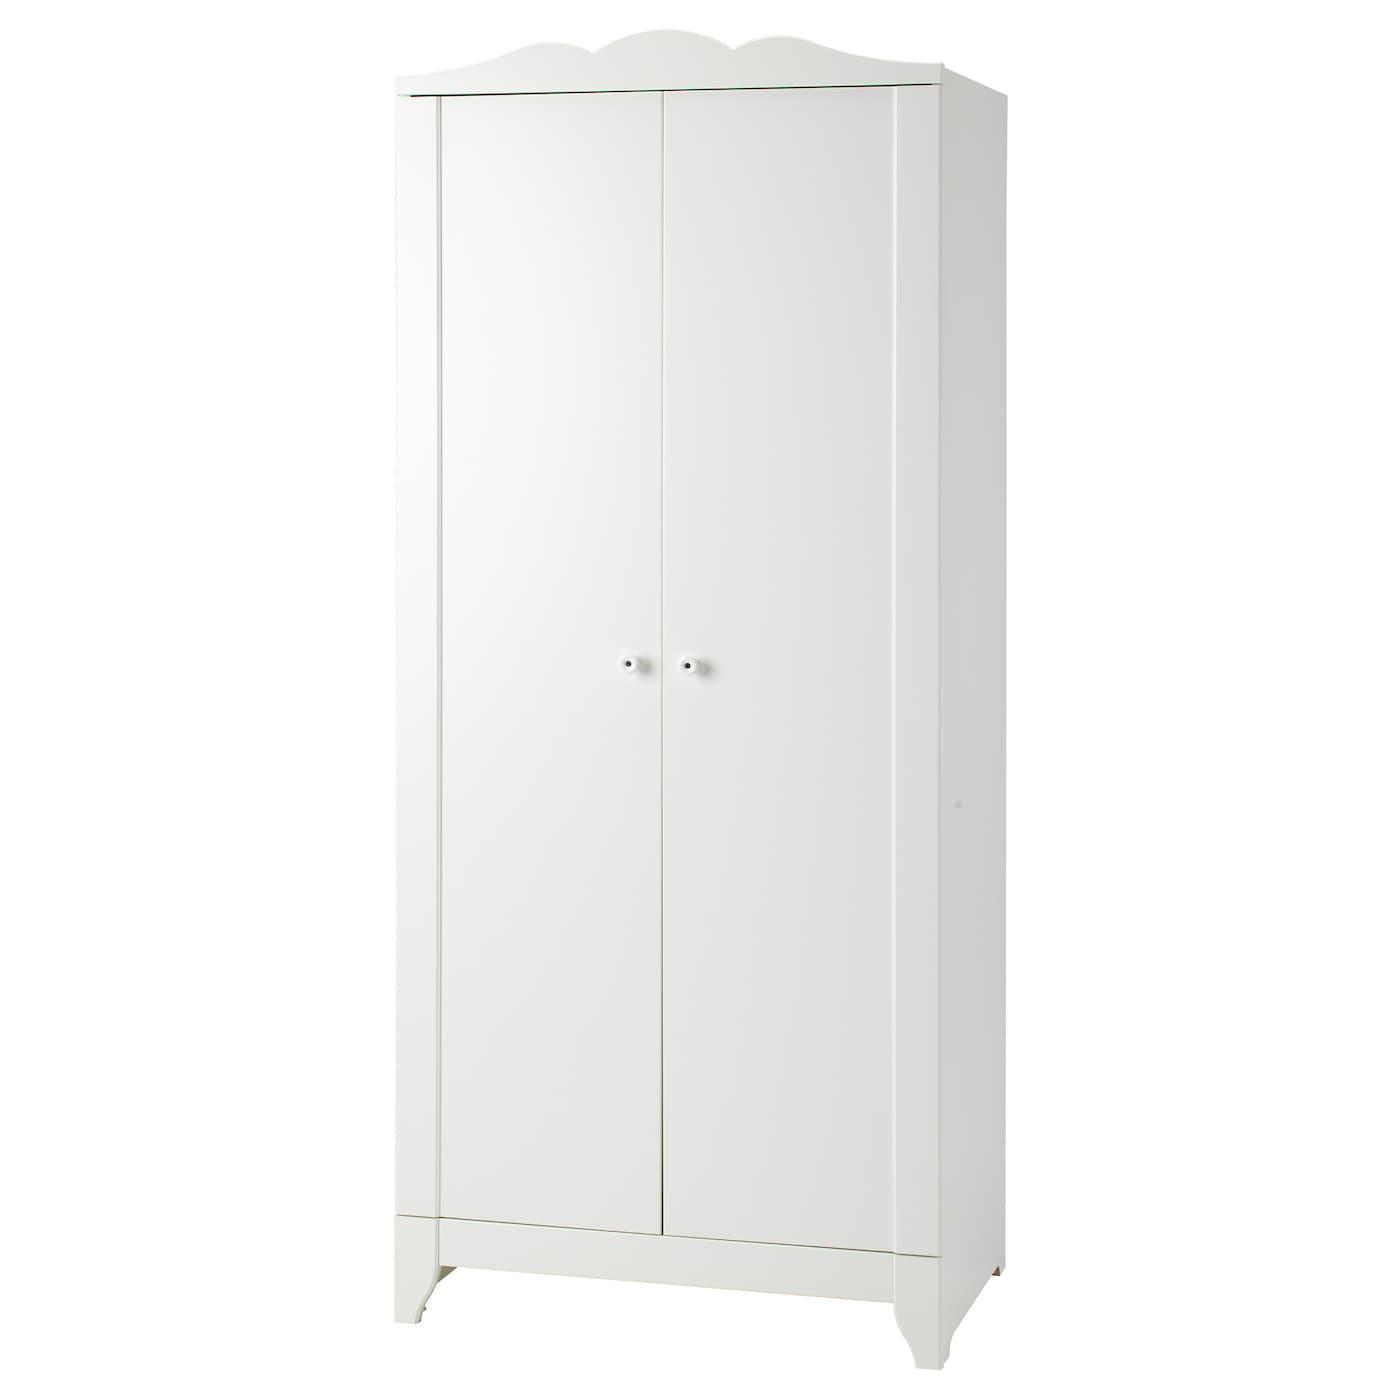 hensvik wardrobe white 75x174 cm ikea